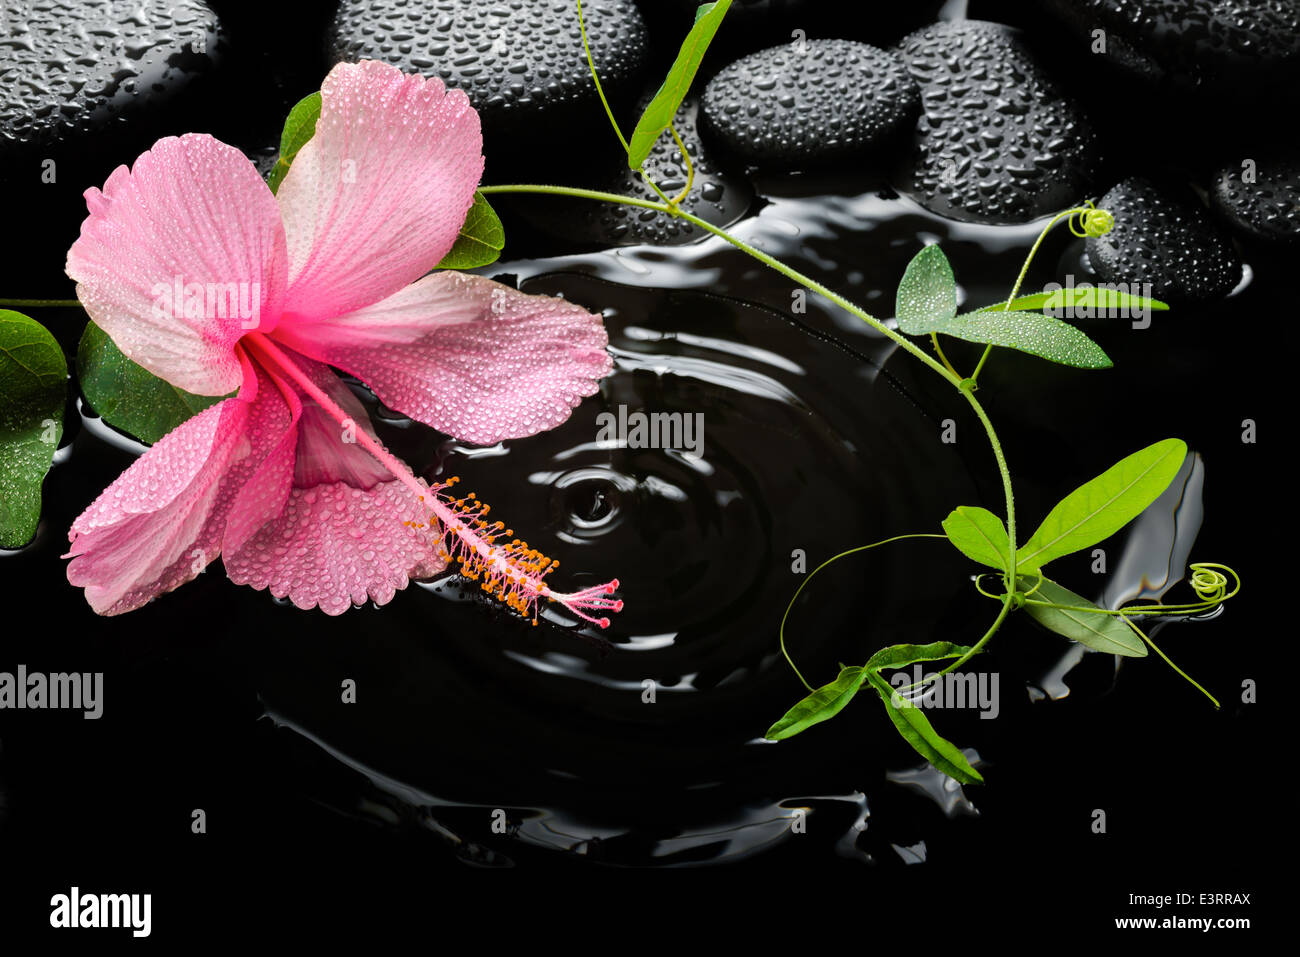 Hibiscus flower branch on black stock photos hibiscus flower spa concept with hibiscus flower on massaging stones and drops stock image izmirmasajfo